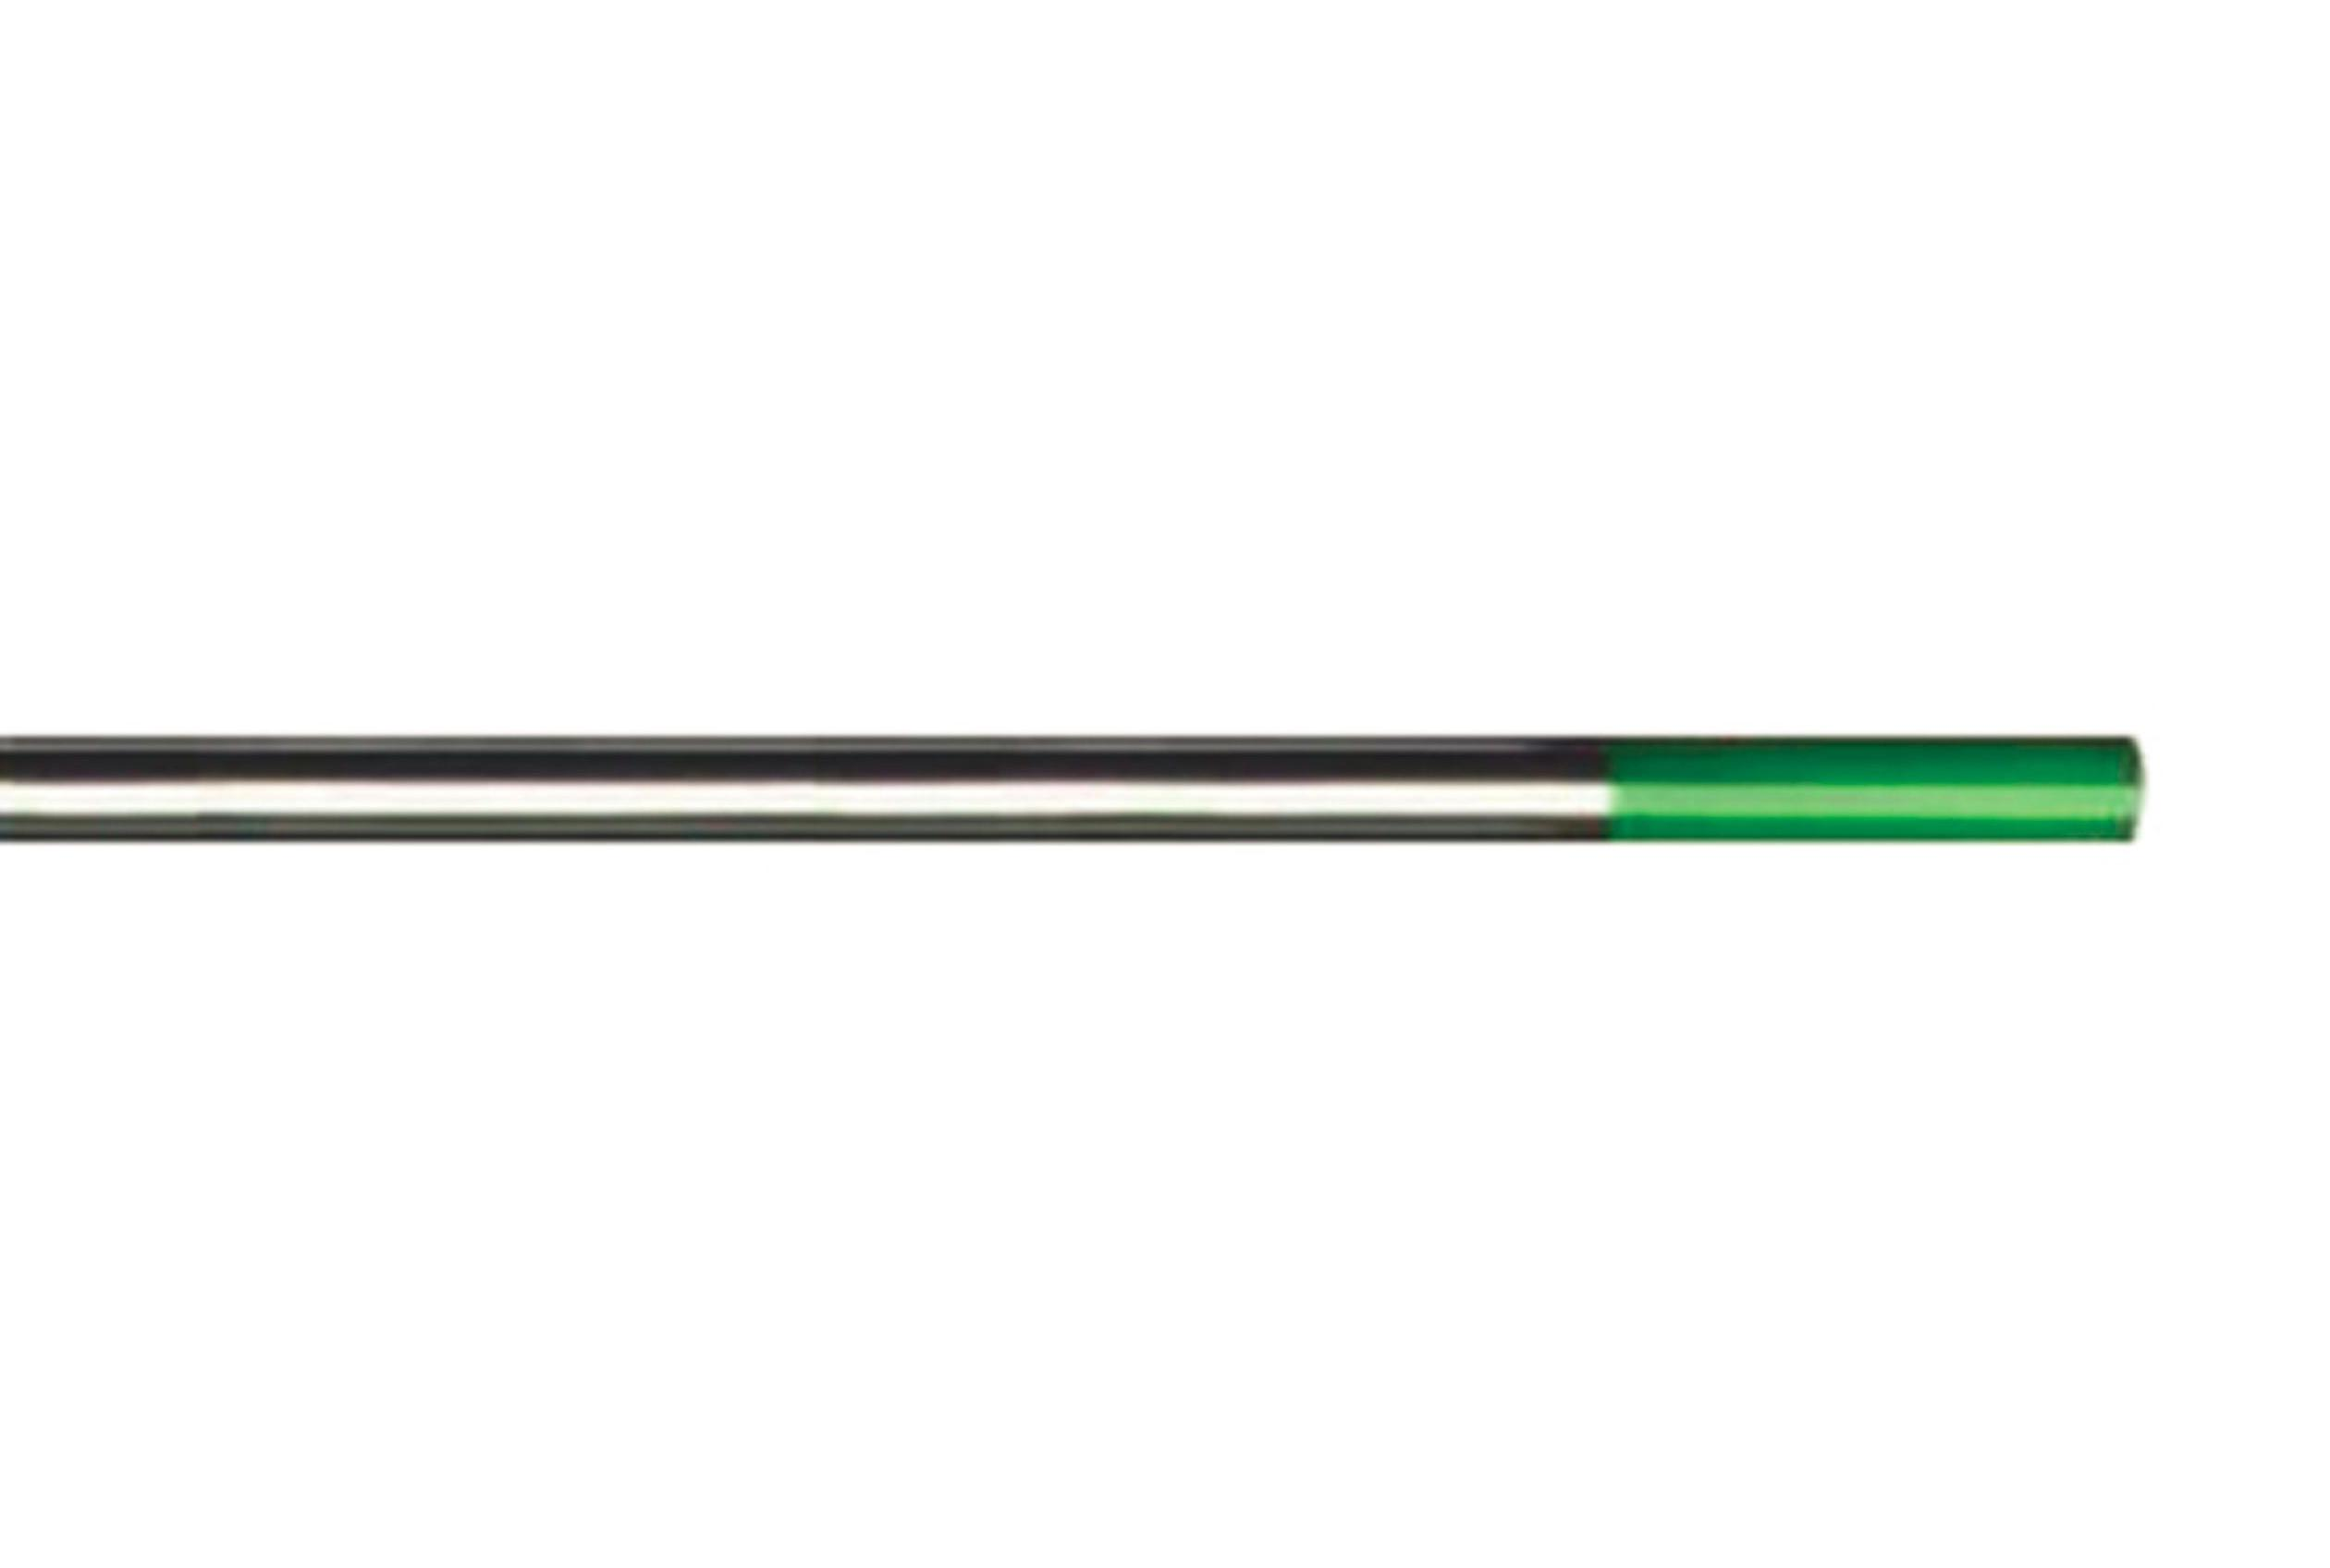 Электроды для сварки Gce Wp (400p016175sb) колонка юнкерс wp 275 bar